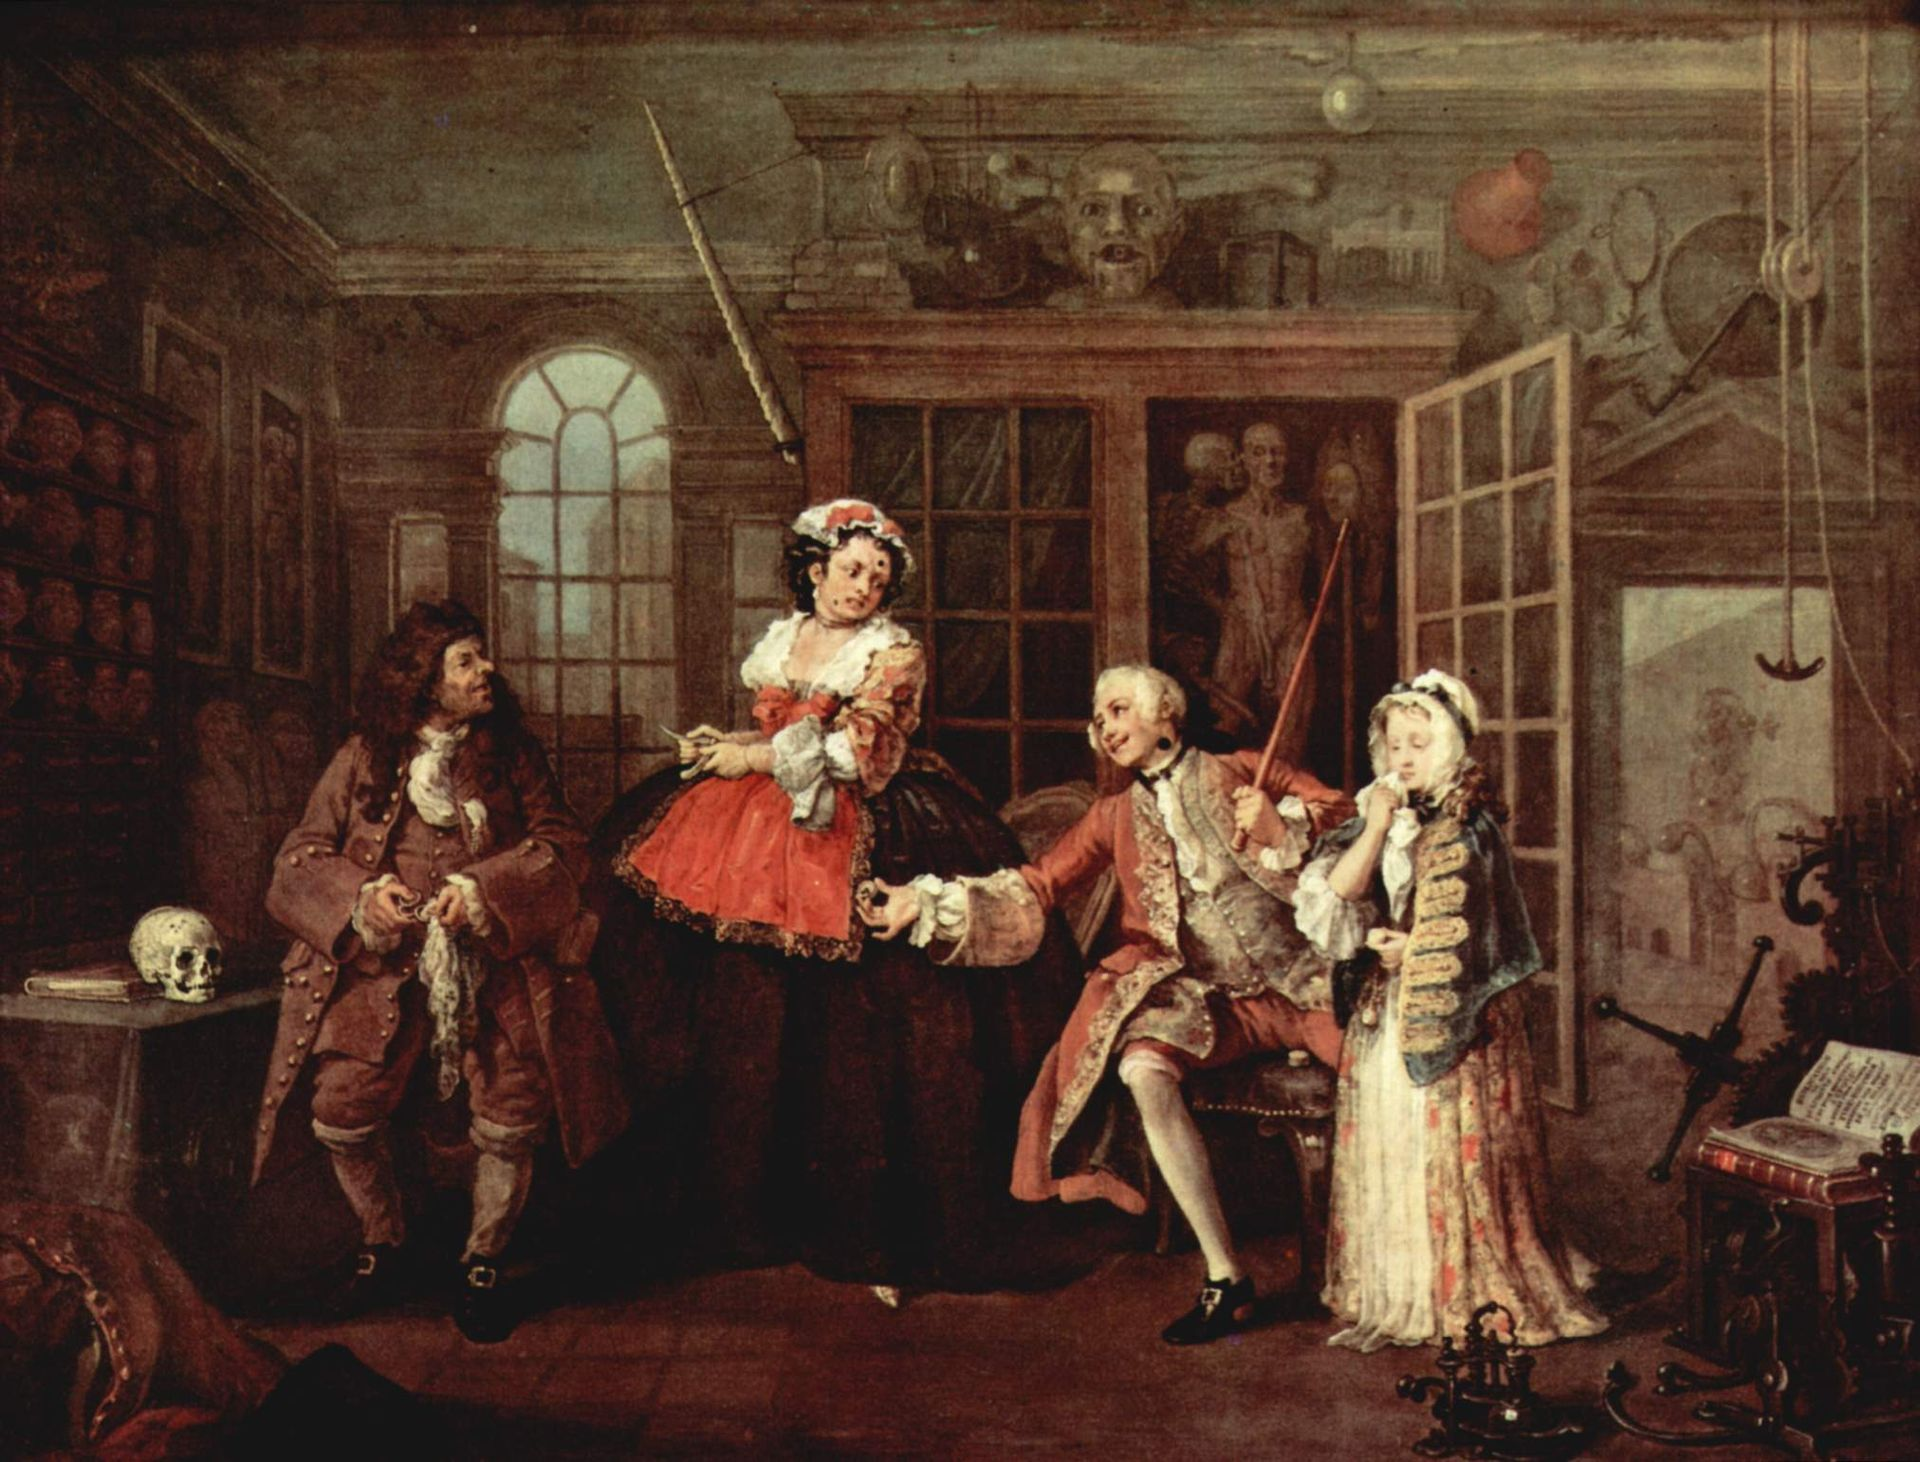 Уильям Хогарт, 1743—1745 гг., картина «Визит к шарлатану»